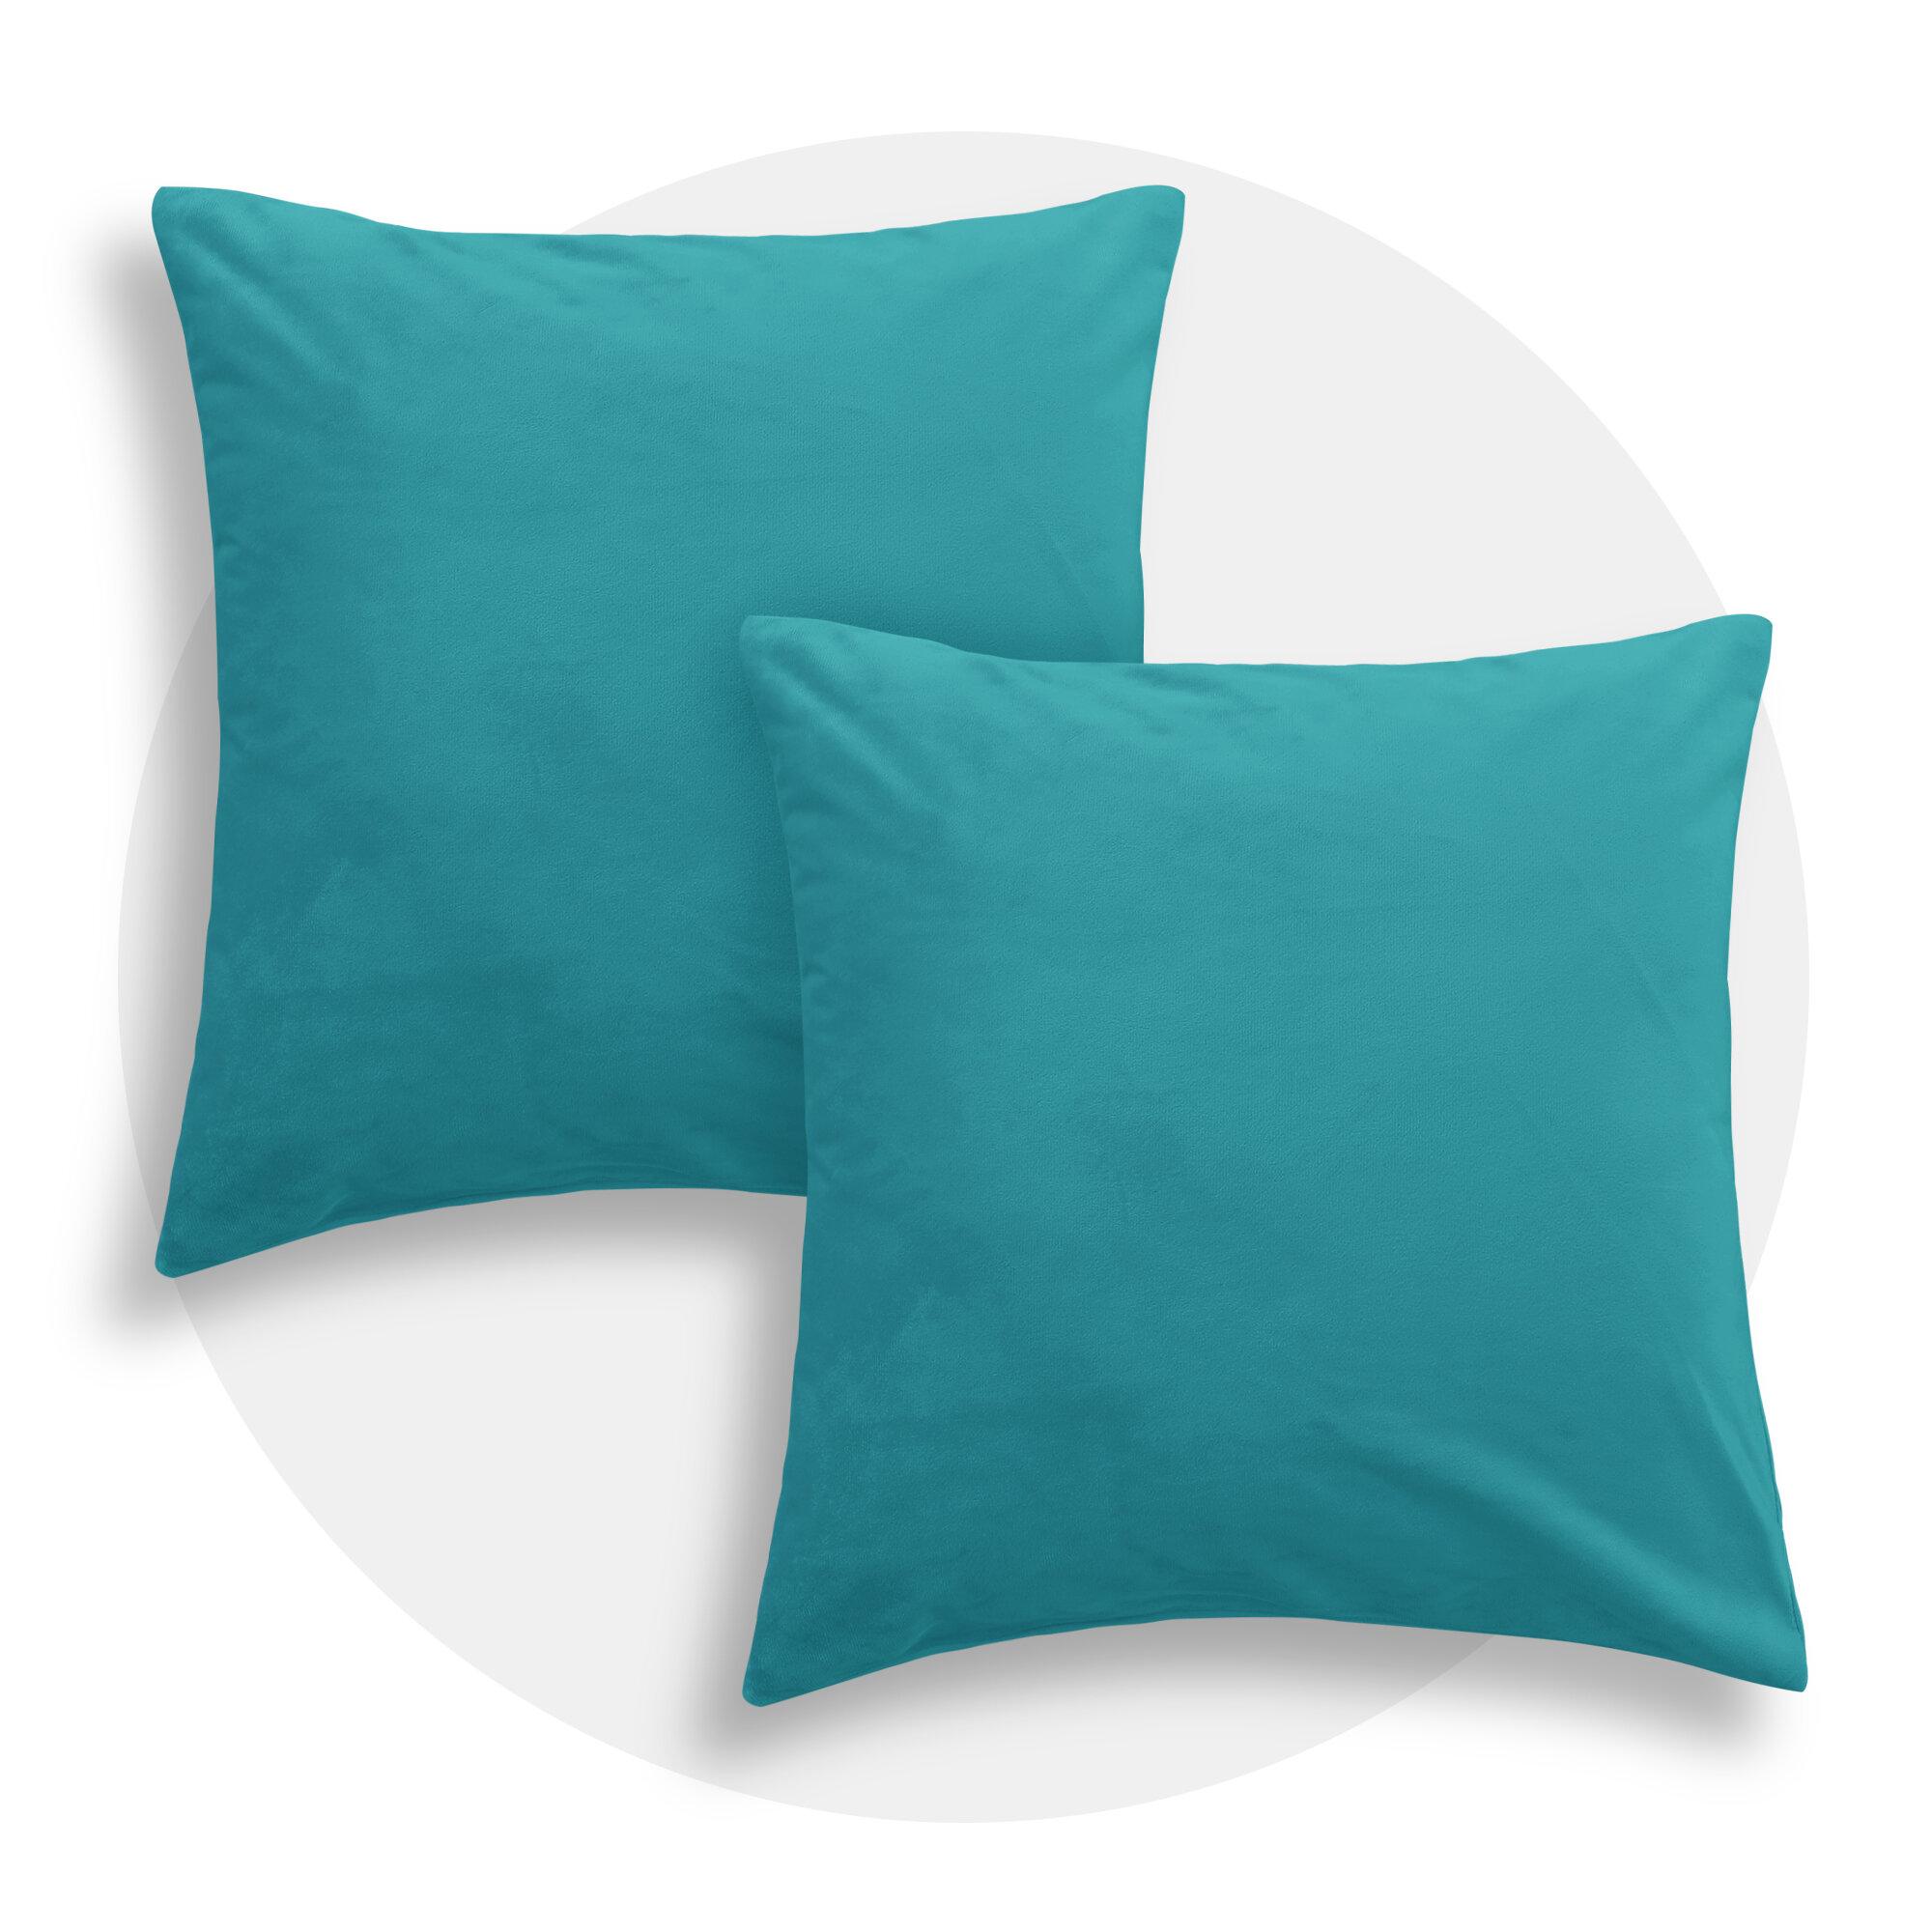 Teal Throw Pillows Free Shipping Over 35 Wayfair